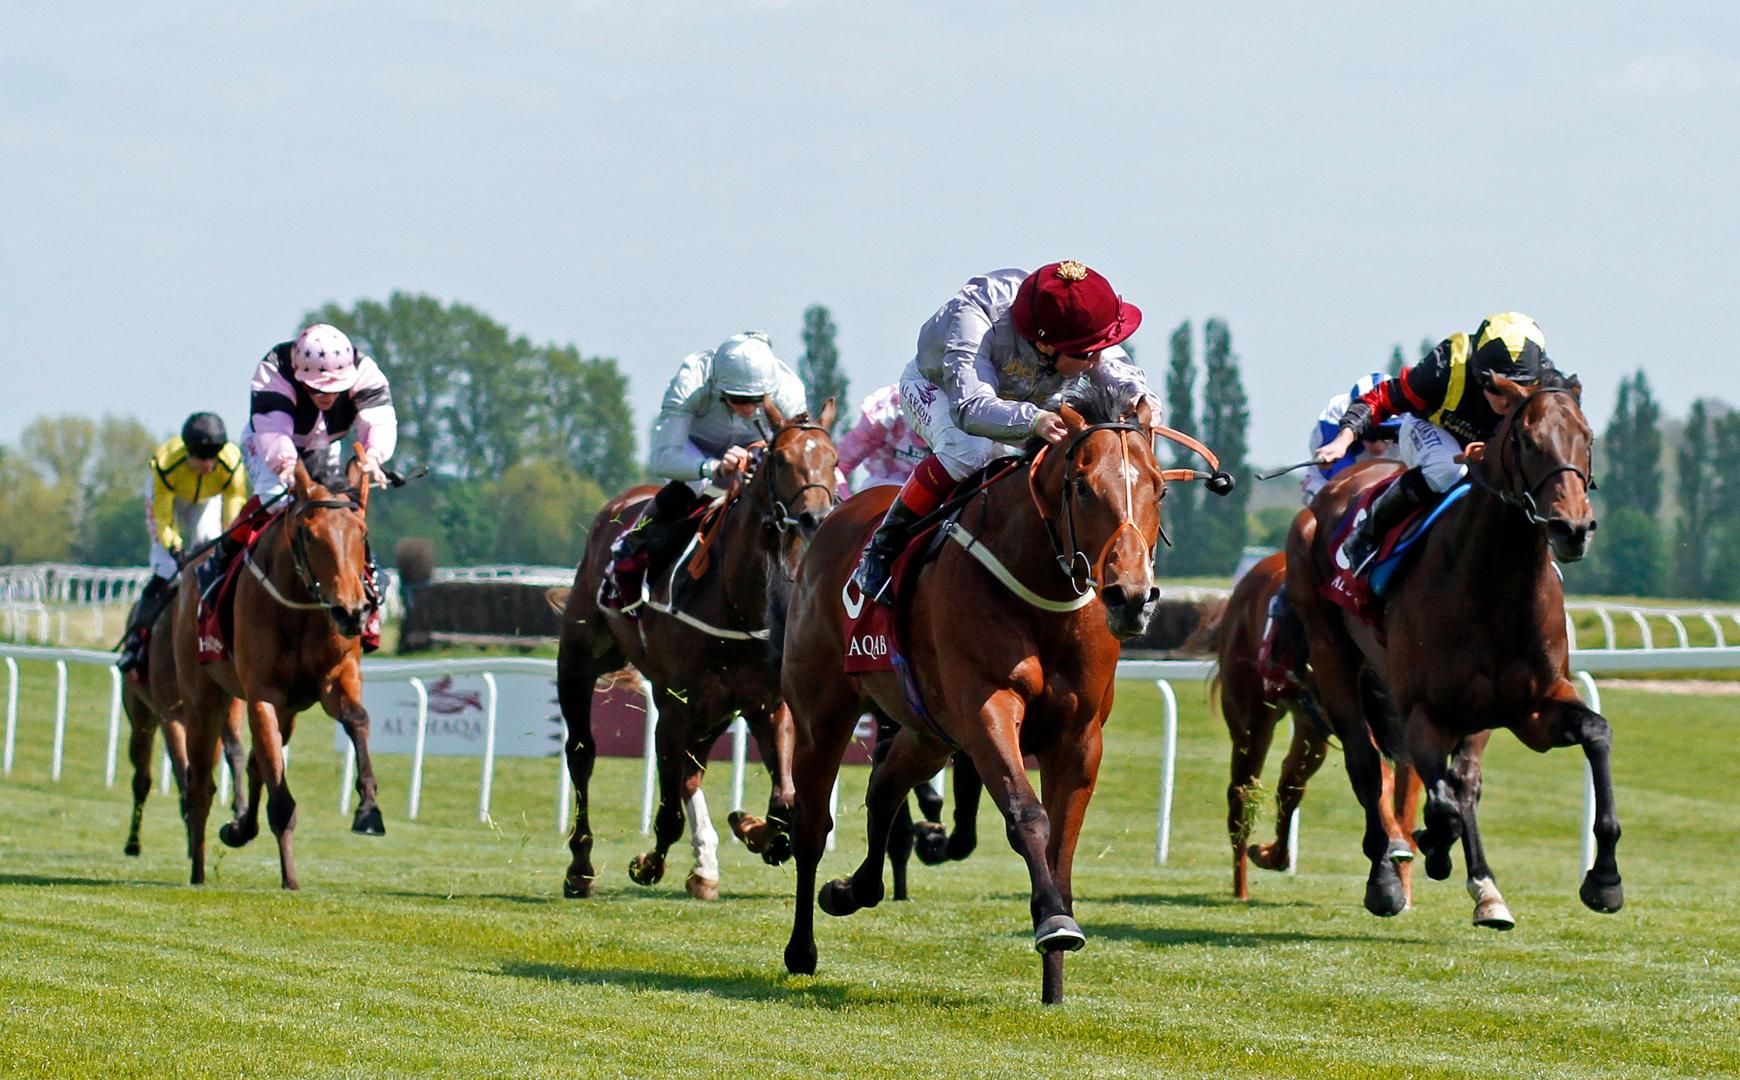 5201006 Newbury 14May16 Mehmas wins The